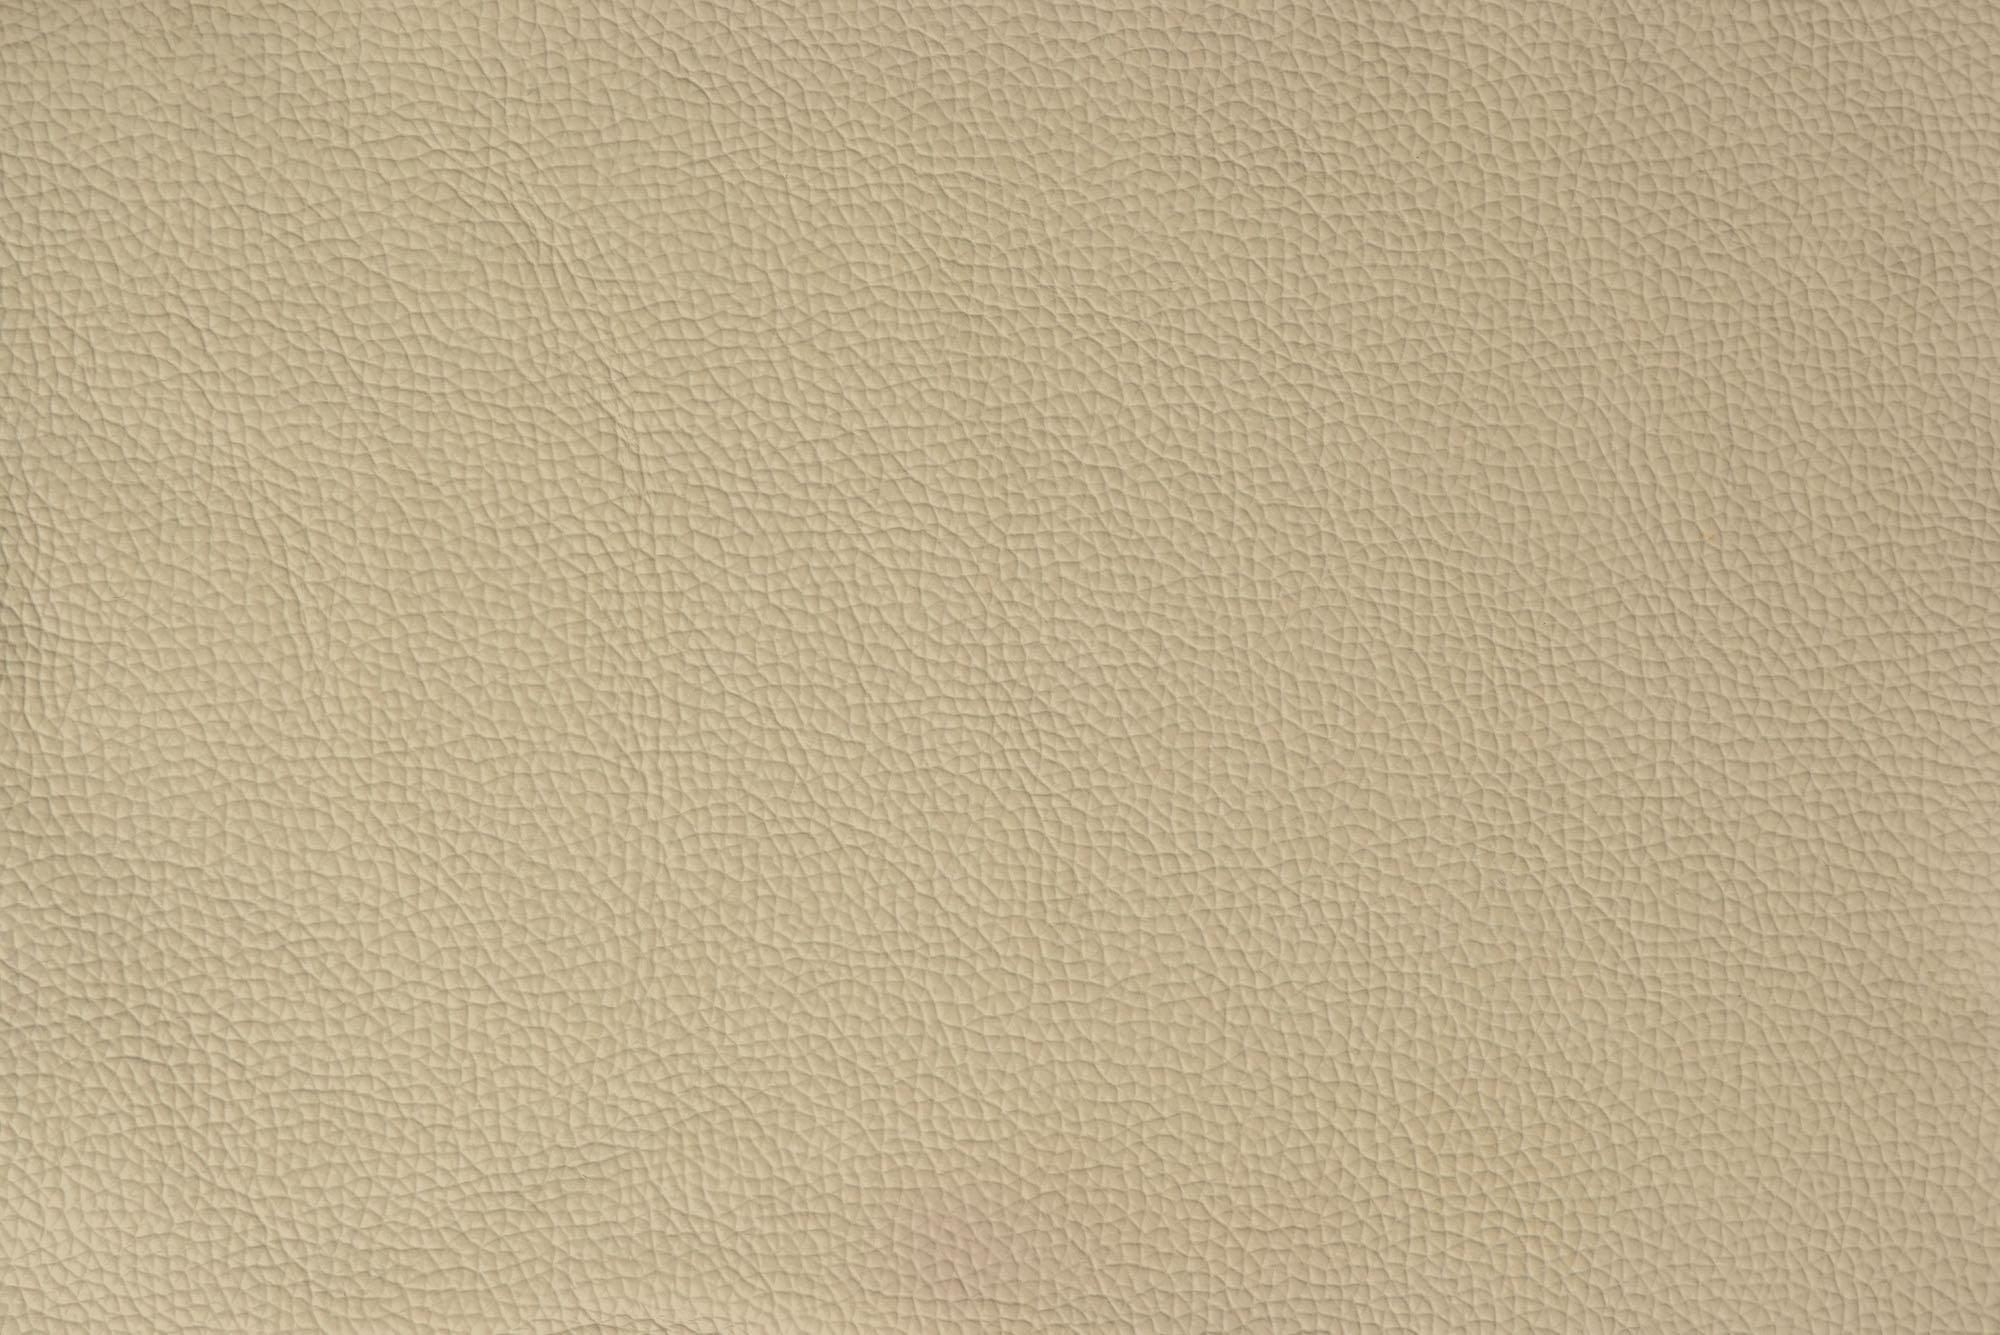 8815A WHITEの素材拡大画像